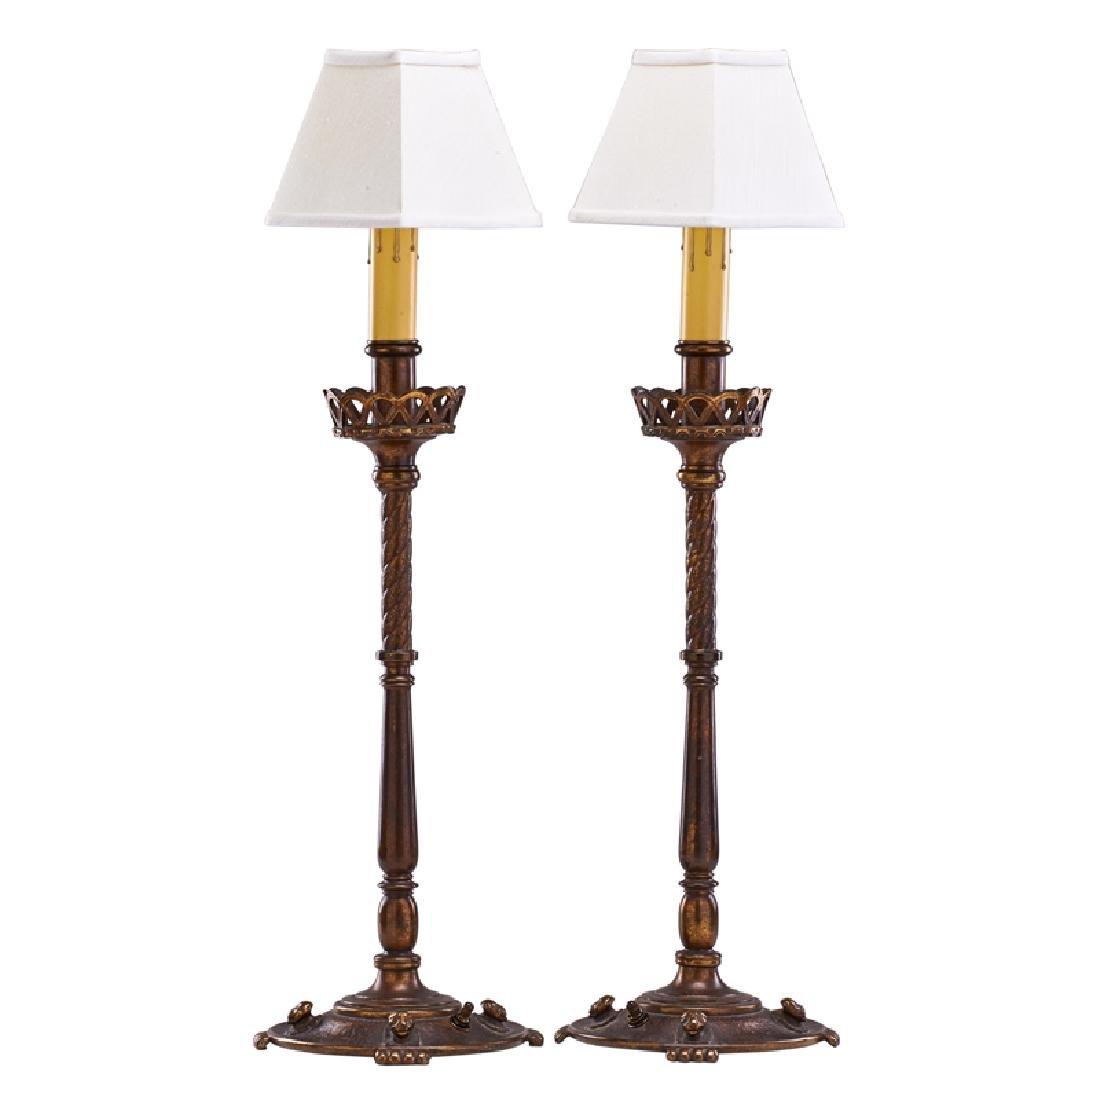 OSCAR BACH Pair of lamps